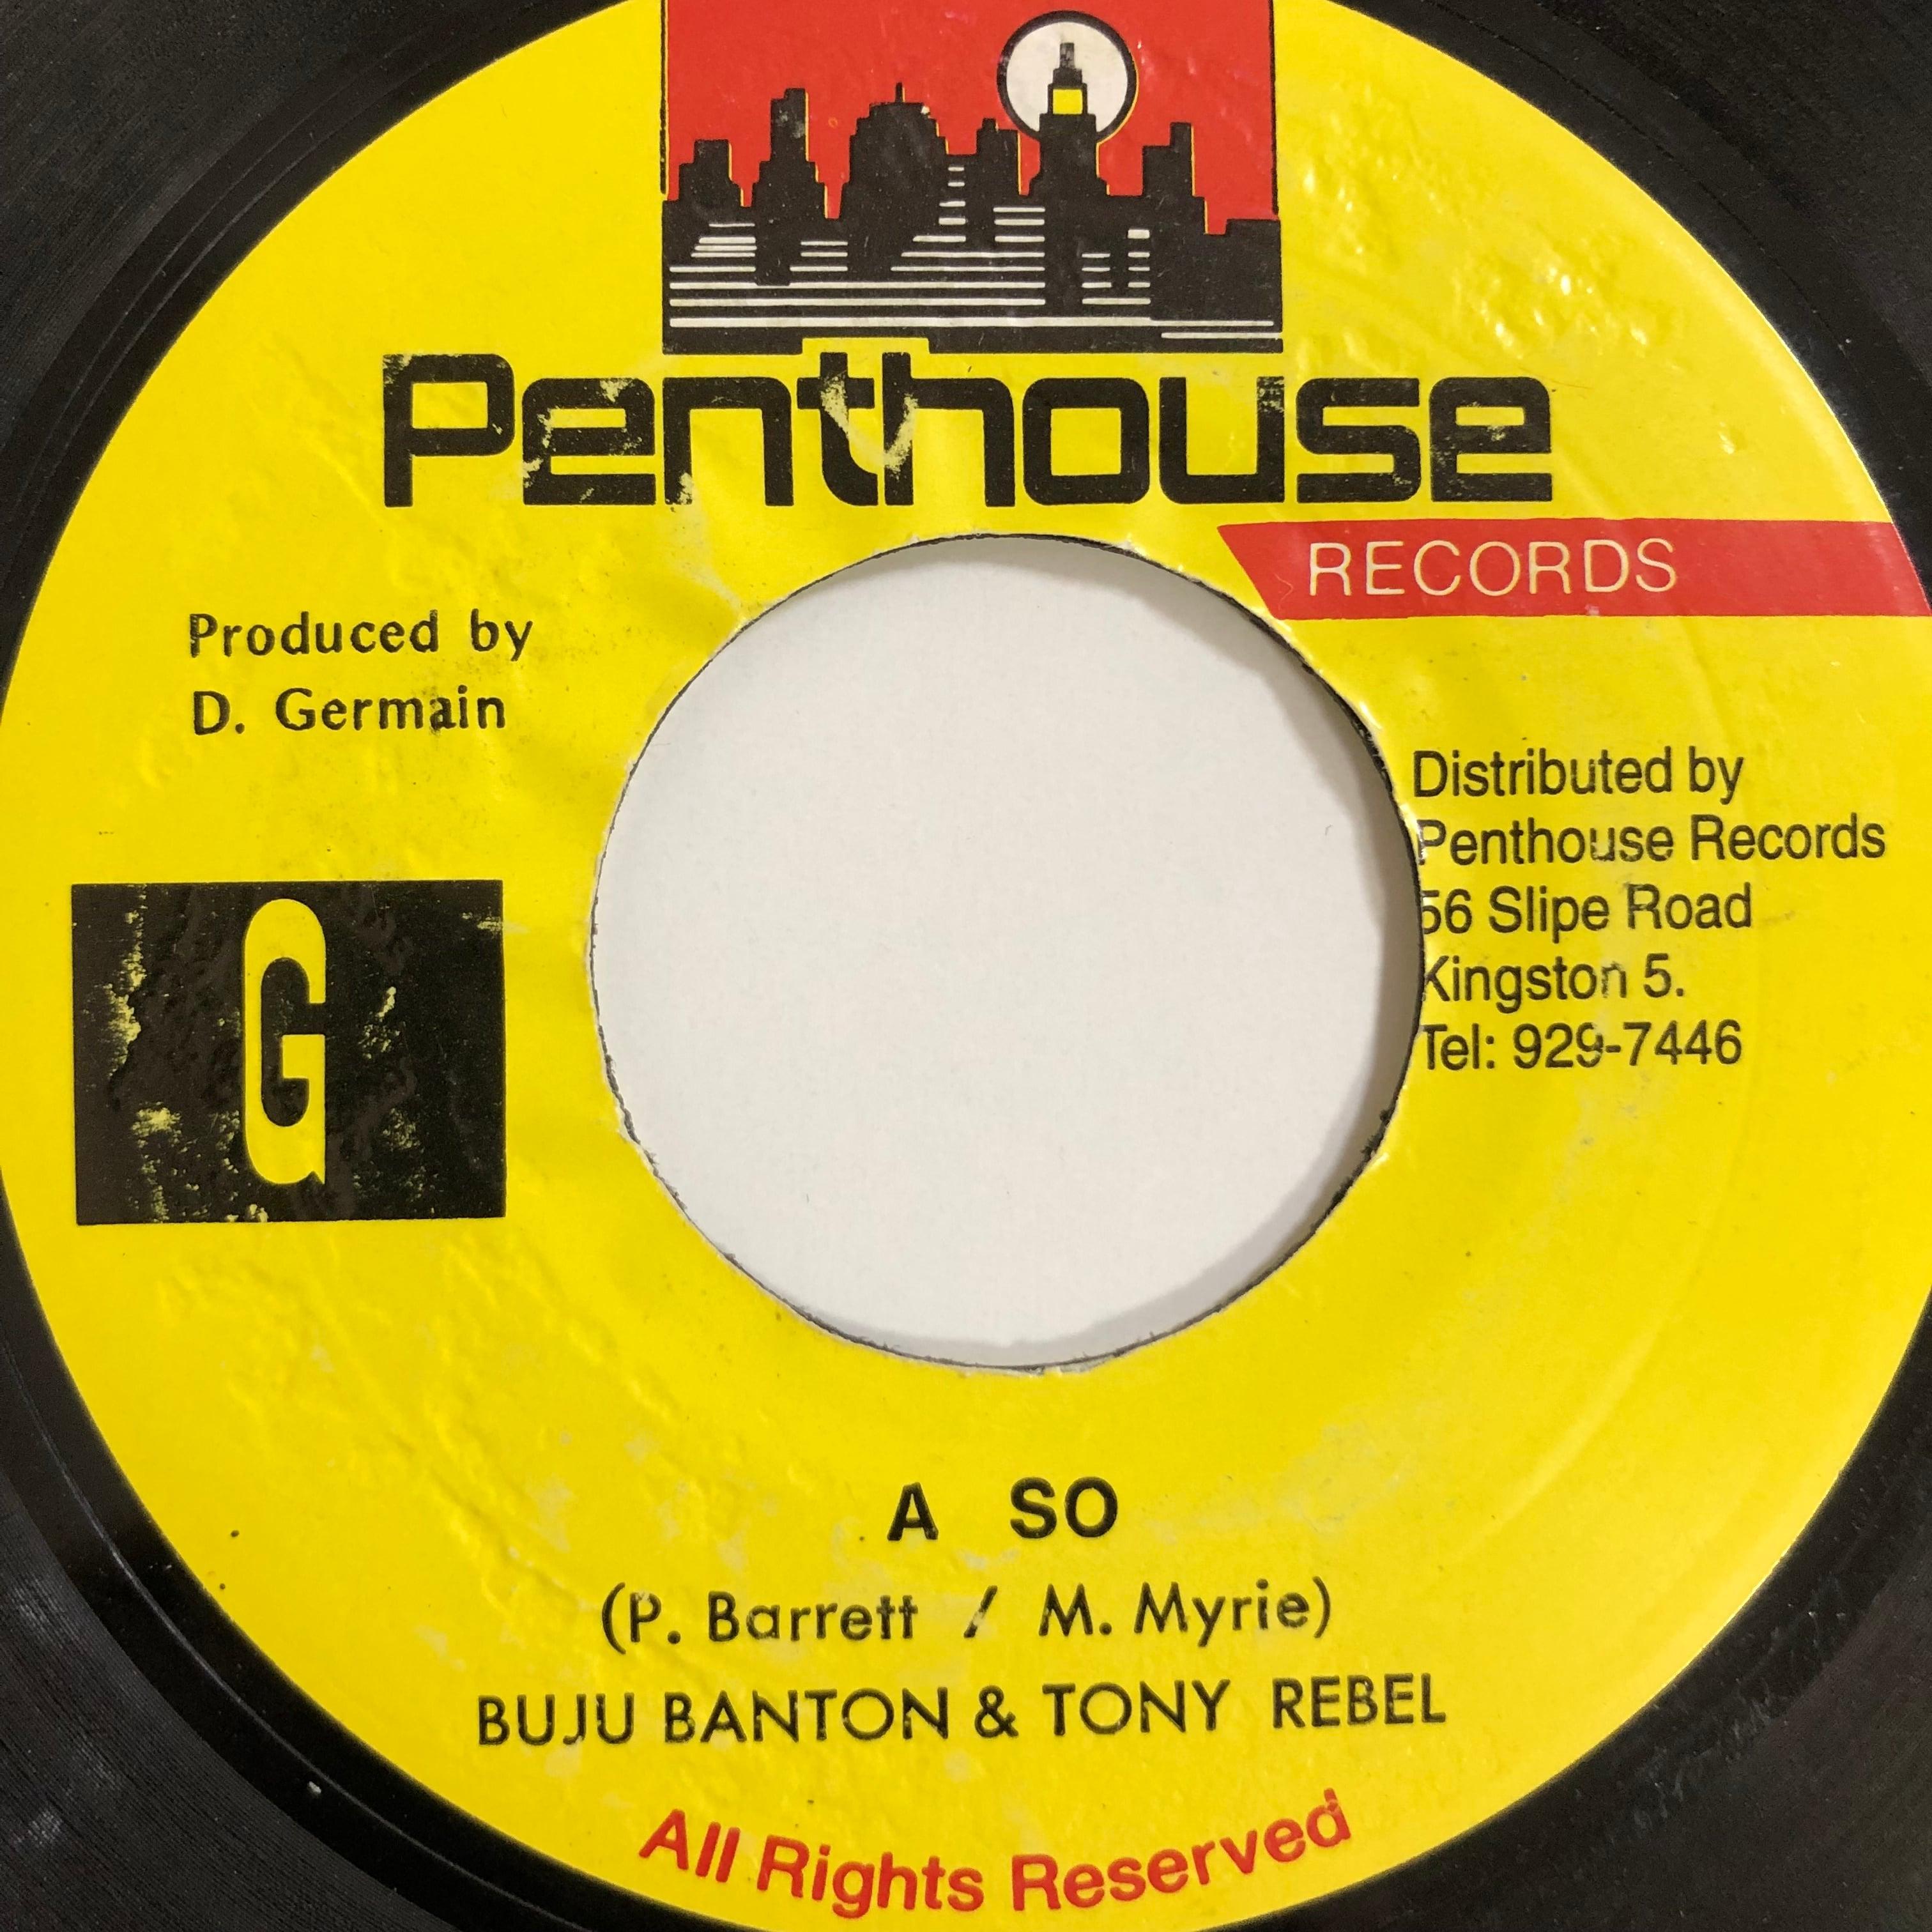 Buju Banton & Tony Rebel - A So【7-20009】